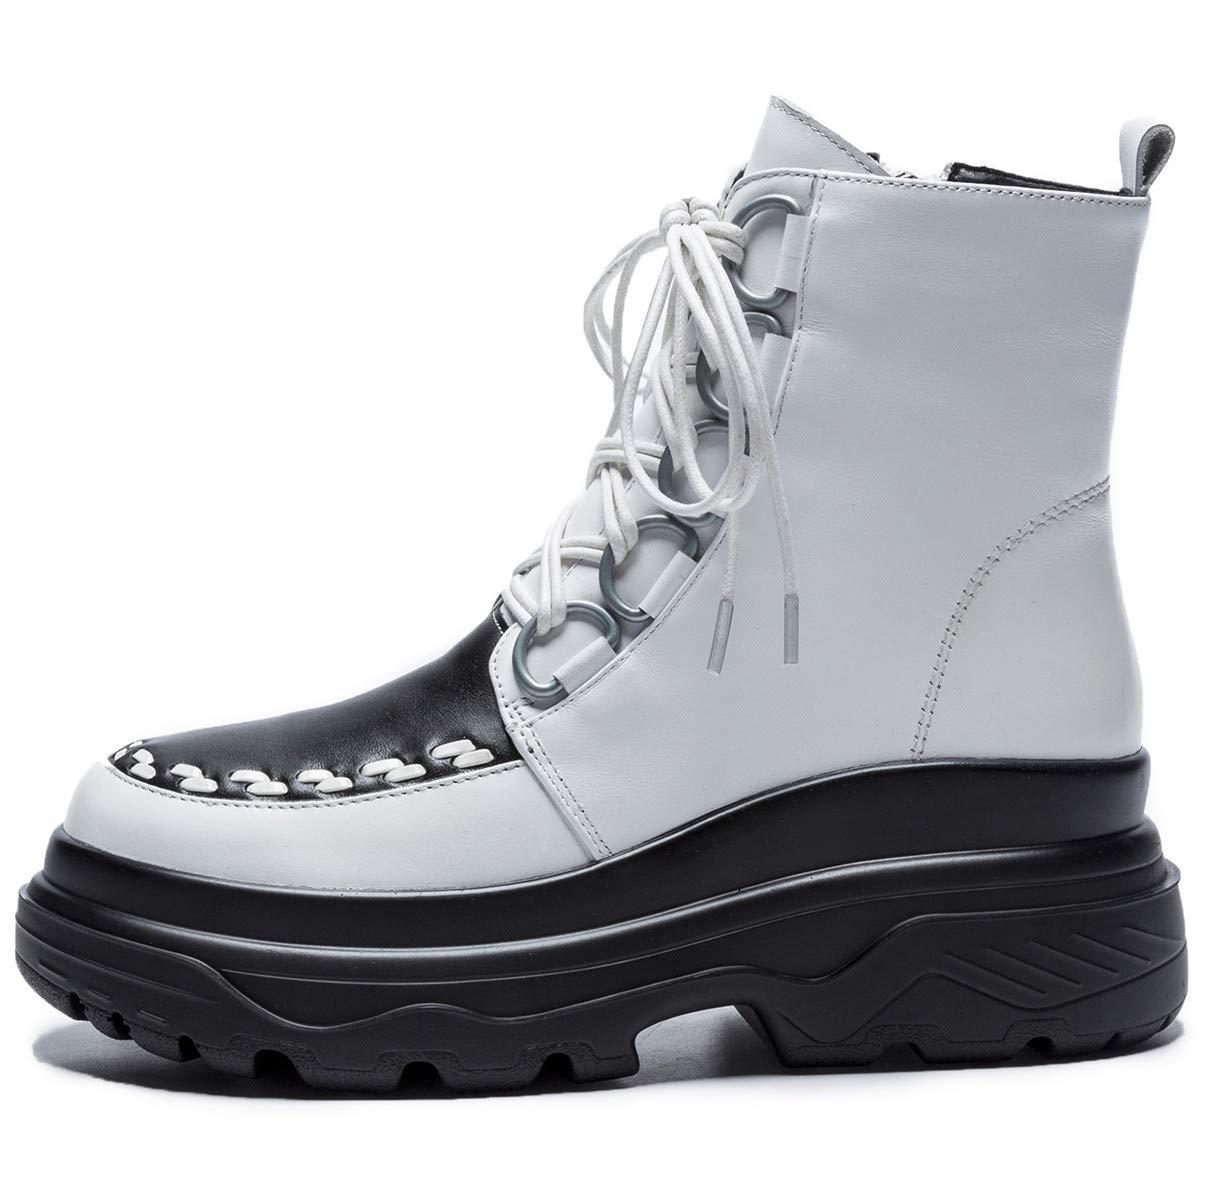 HHXWU Schuhe Damenschuhe Stiefelies Plateau Lace Damen Stiefel Leder Lace Plateau Martin Stiefel, weiß warm, 39 12b897